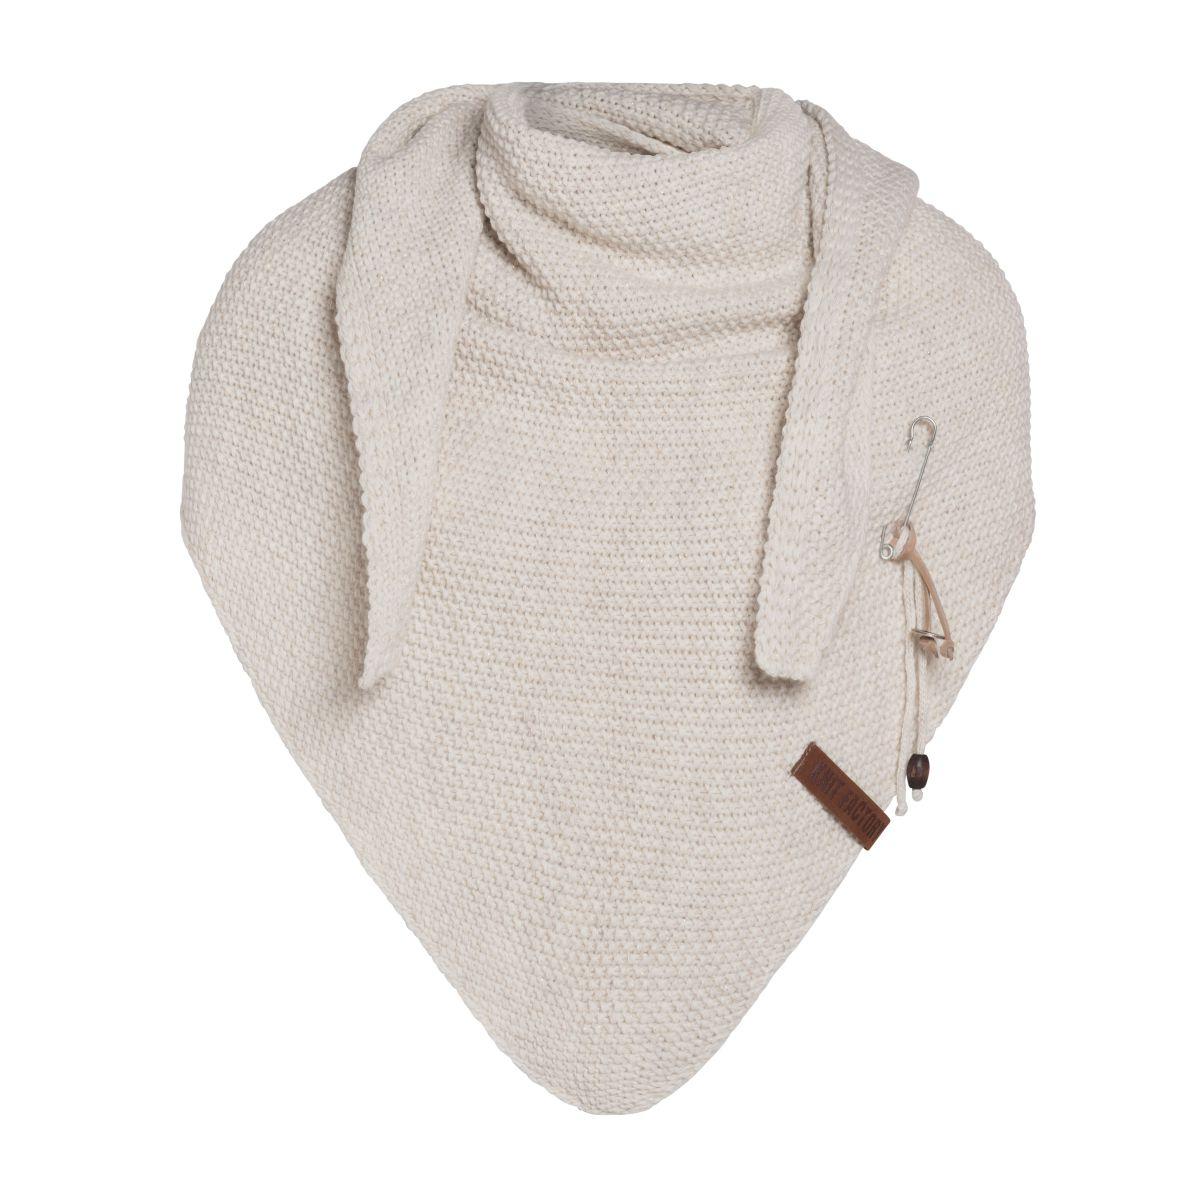 coco triangle scarf deluxe beige